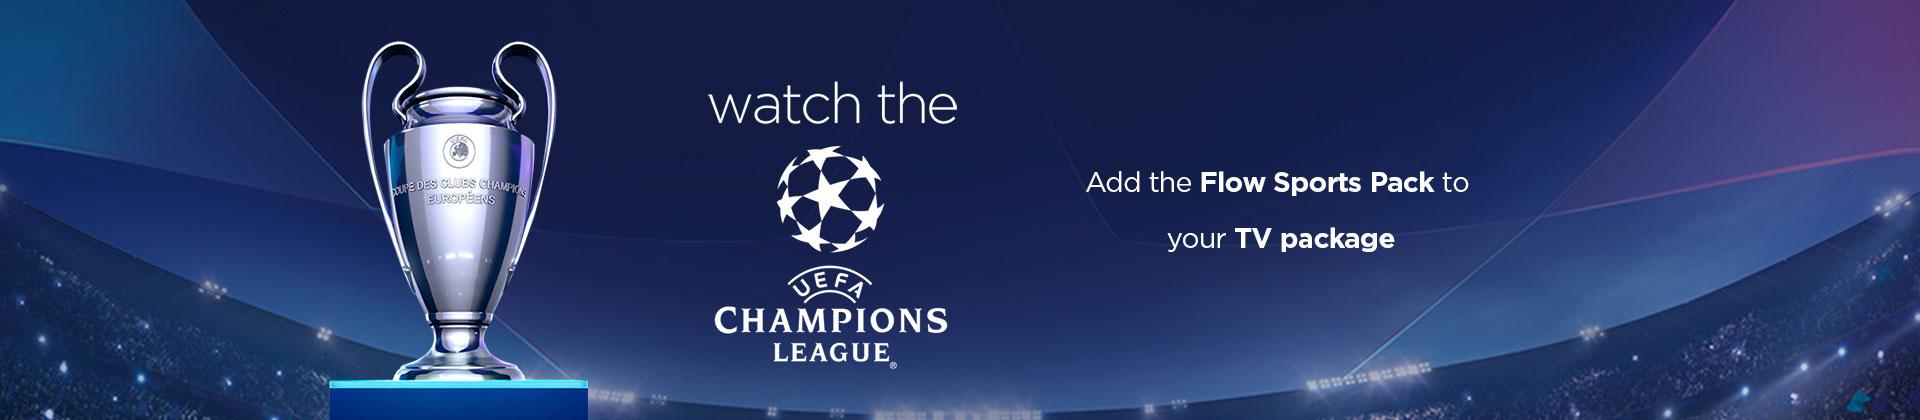 NON-BUNDLE_WebsiteBanner_Hero-Banner_ChampionsLeague-edit